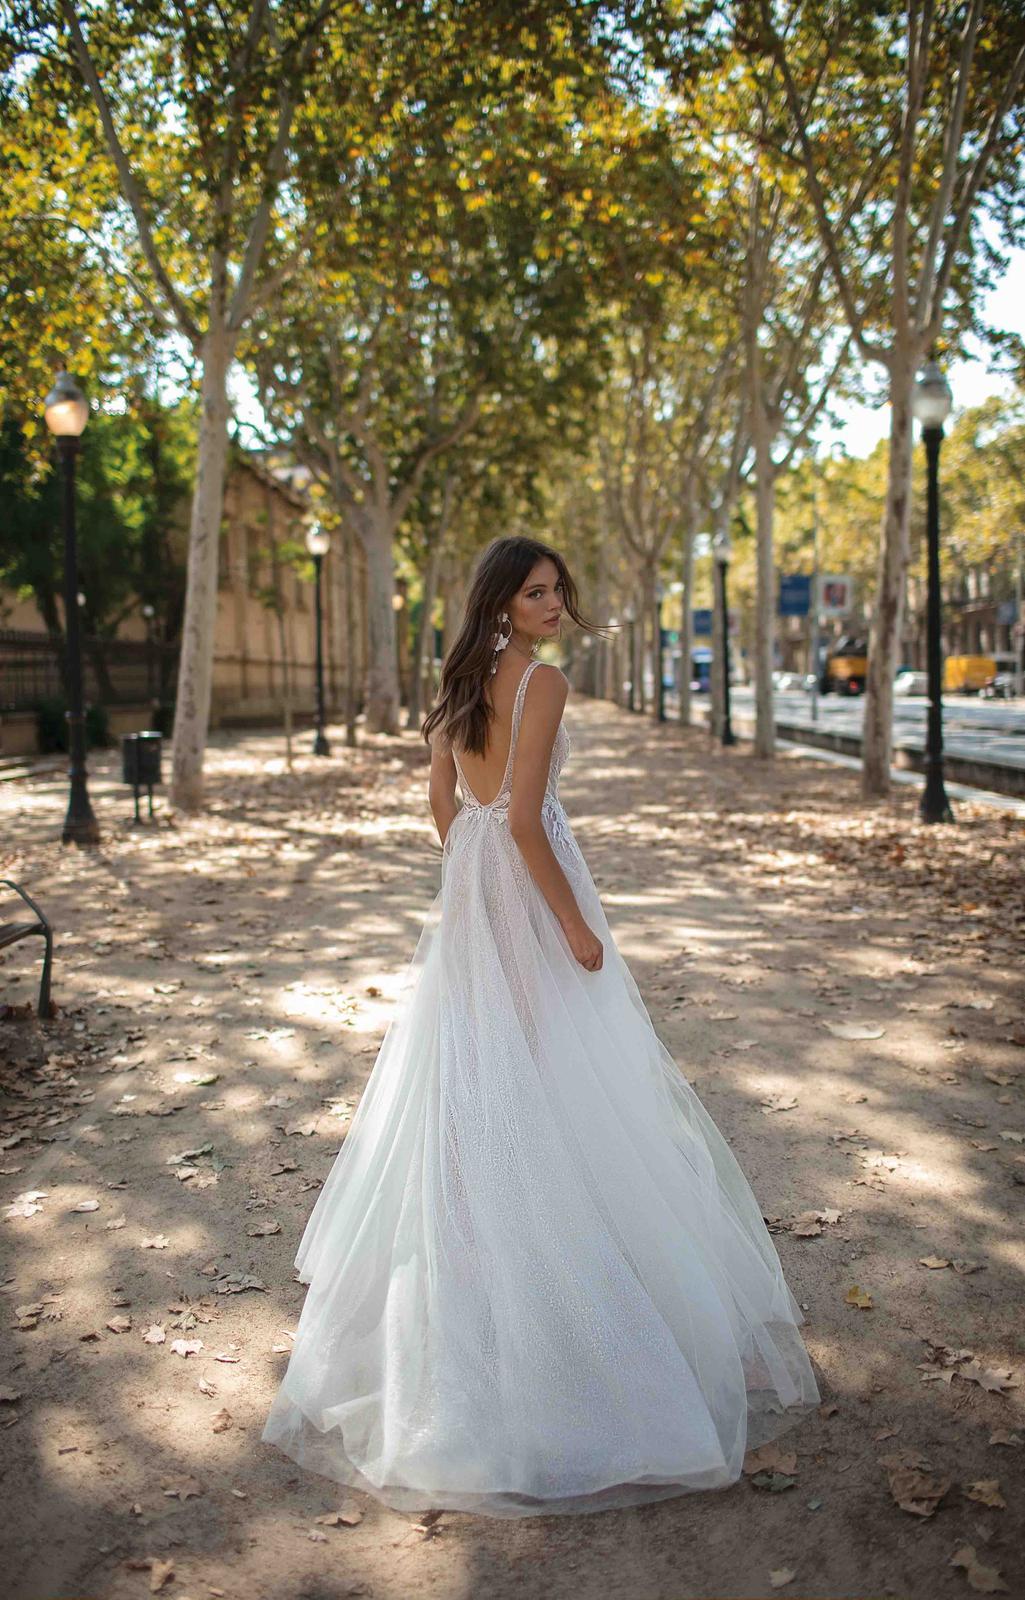 Muse by Berta * Svadobné šaty z kolekcií na rok 2019 - Obrázok č. 34